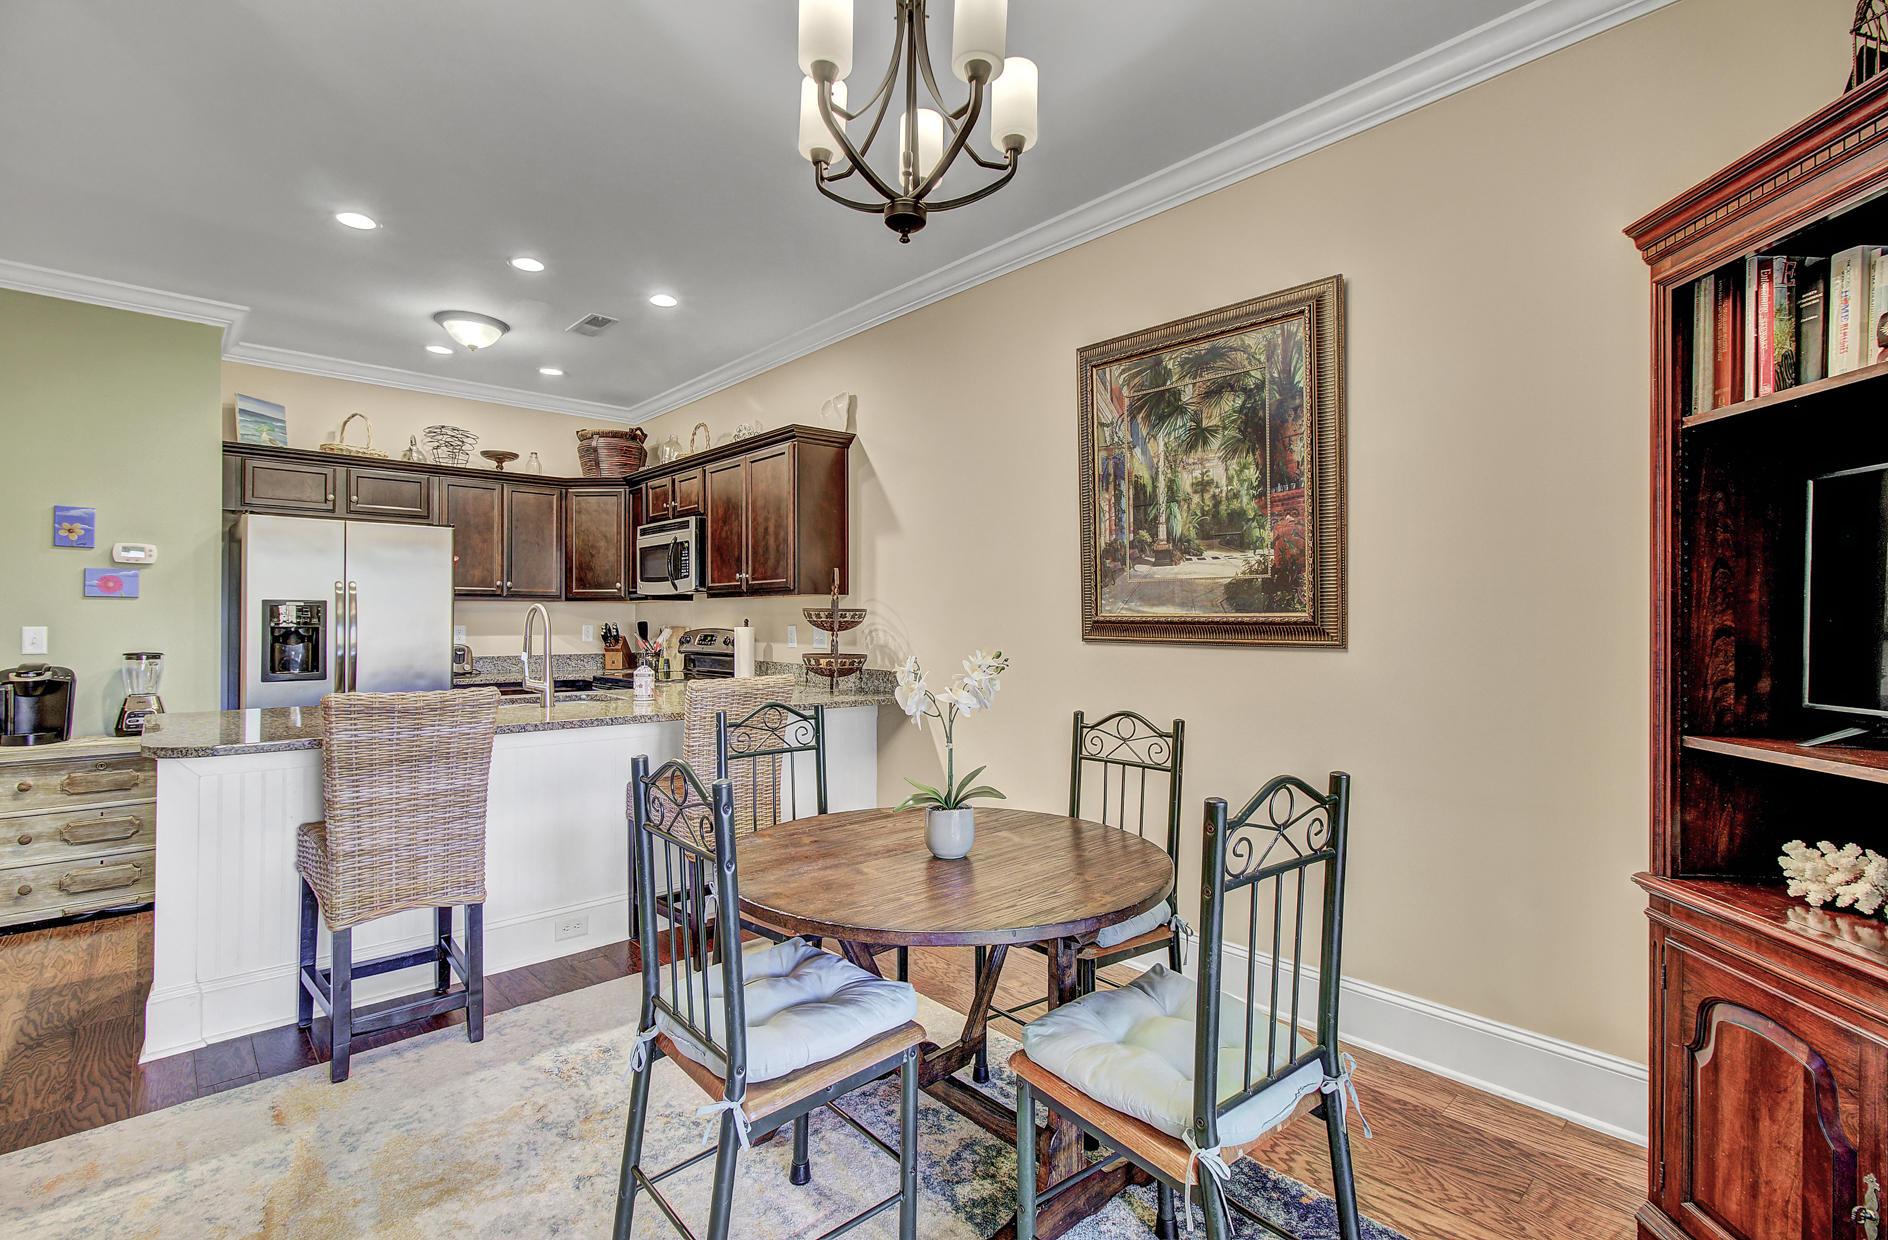 Carol Oaks Town Homes Homes For Sale - 2956 Emma, Mount Pleasant, SC - 19